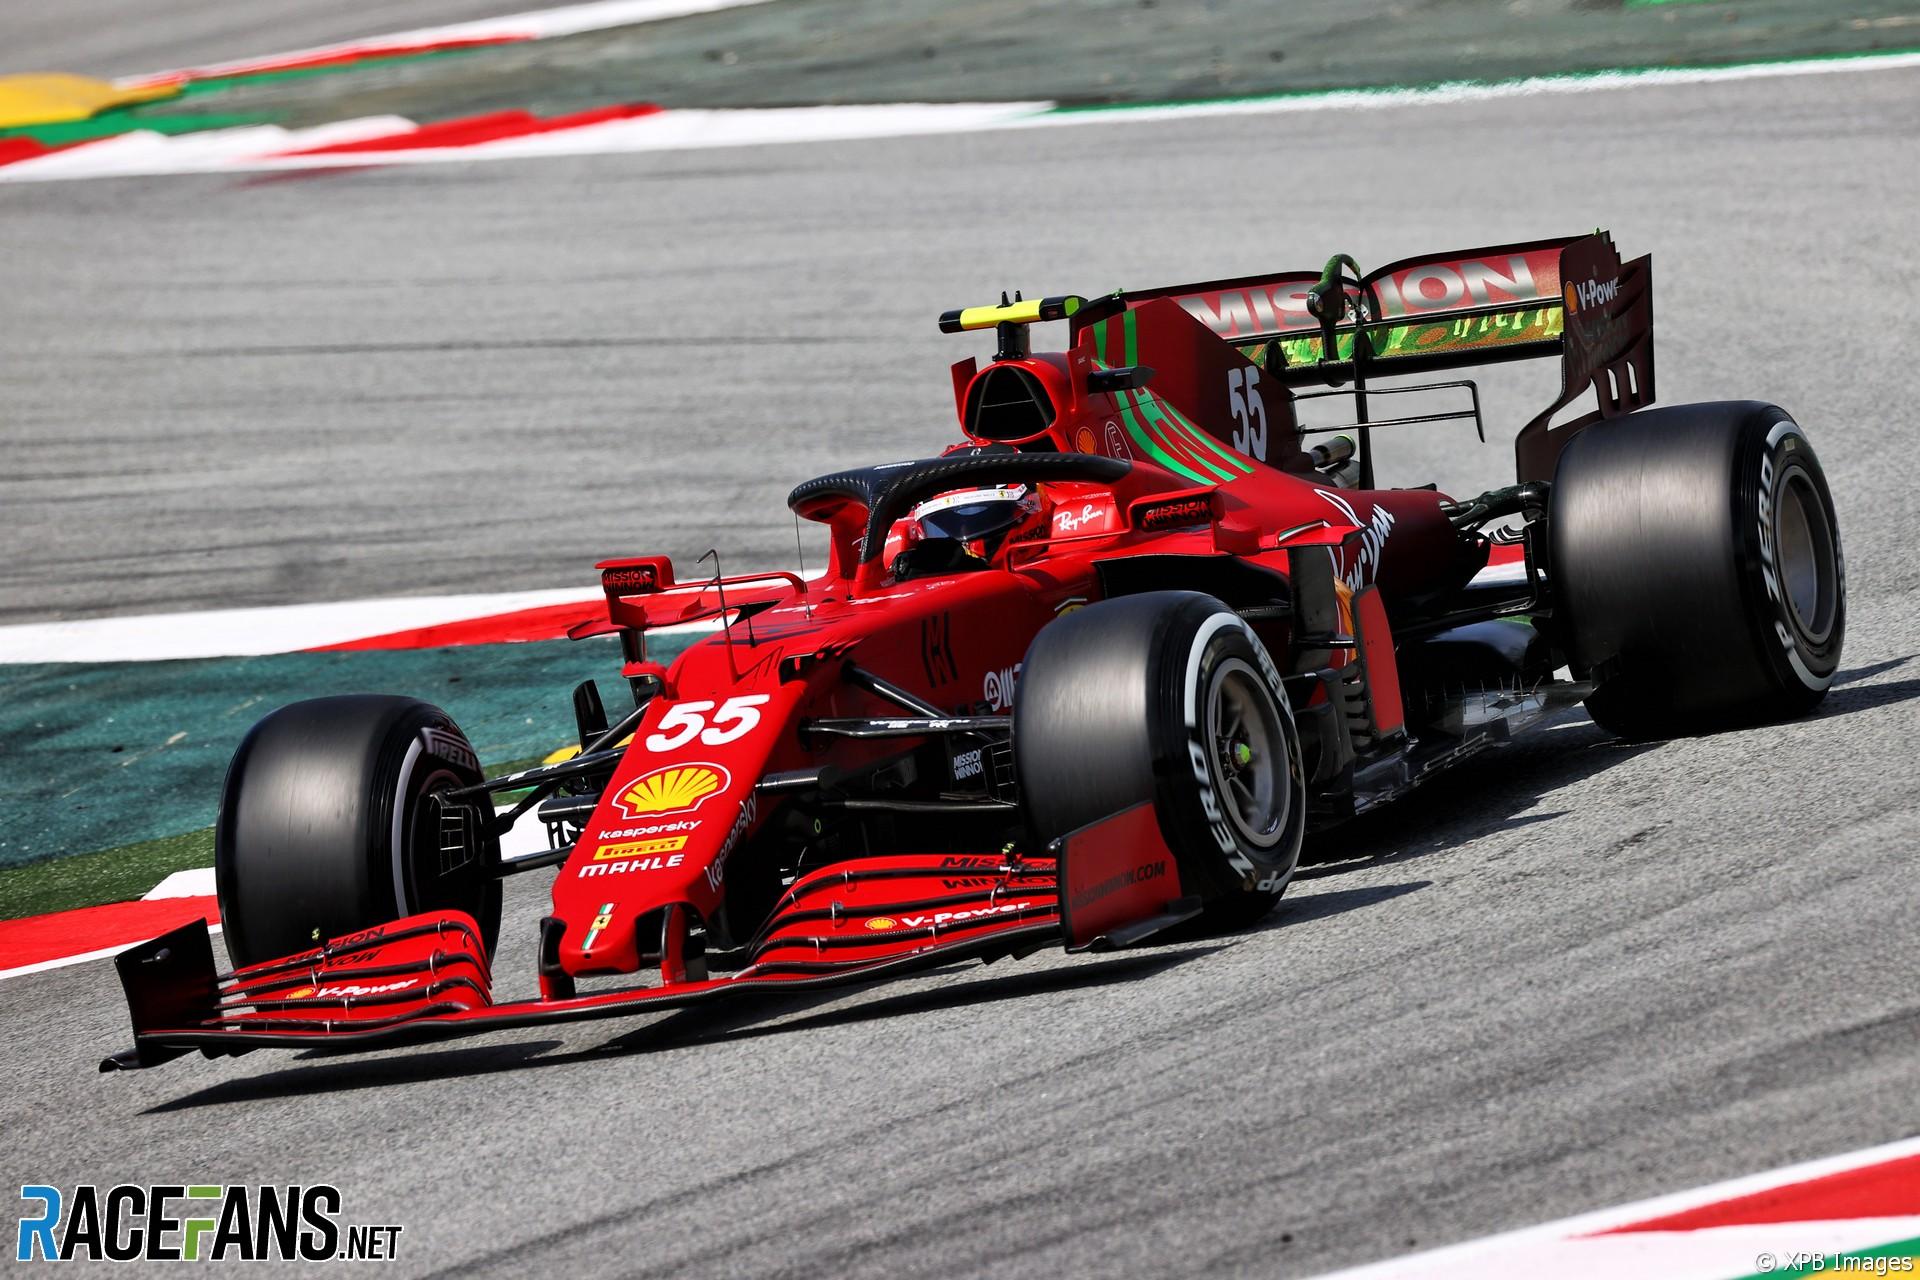 Carlos Sainz Jnr, Ferrari, Circuit de Catalunya, 2021